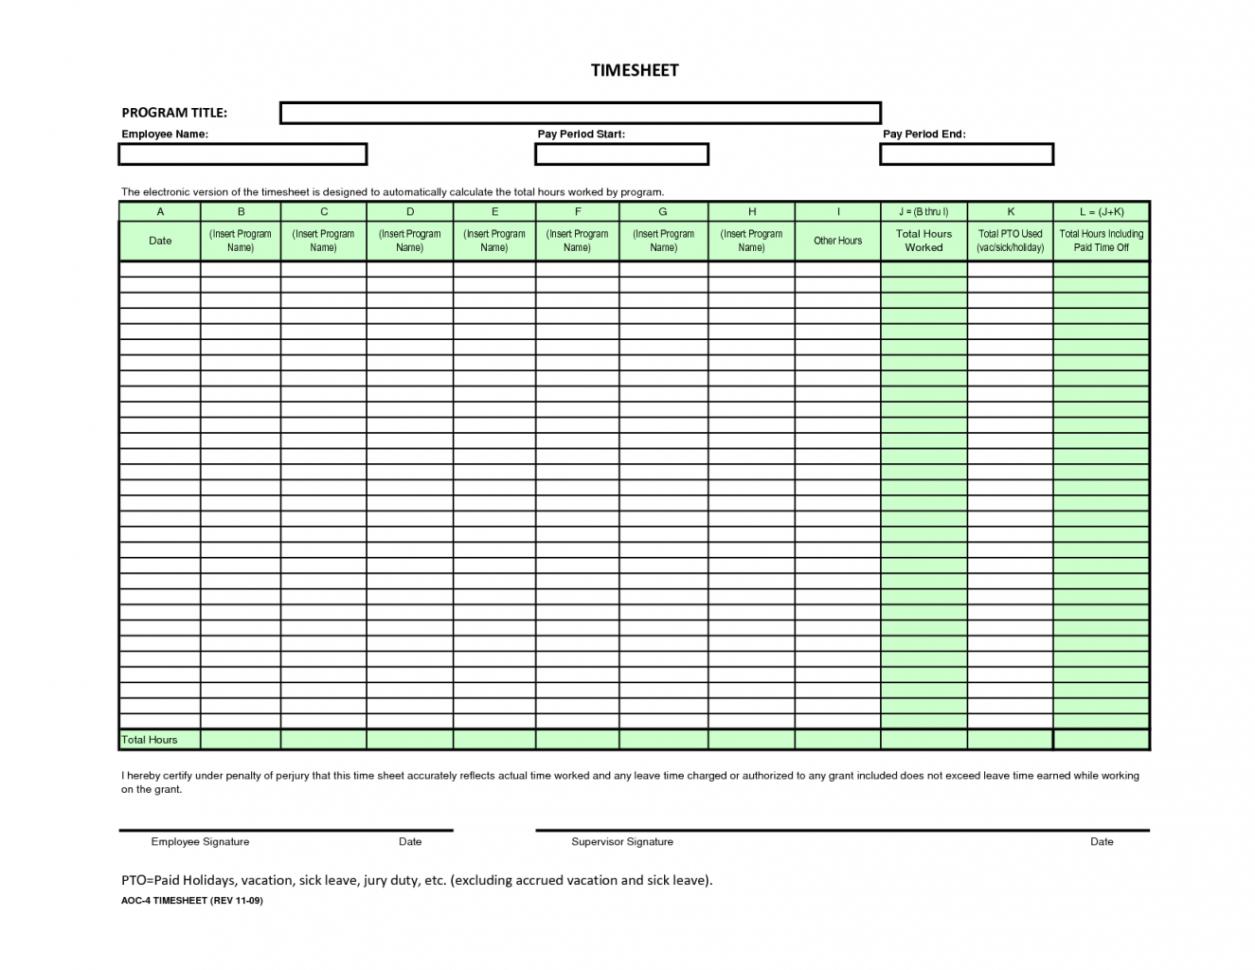 Free Holiday Spreadsheet Throughout Vacation Accrual Spreadsheet  Homebiz4U2Profit